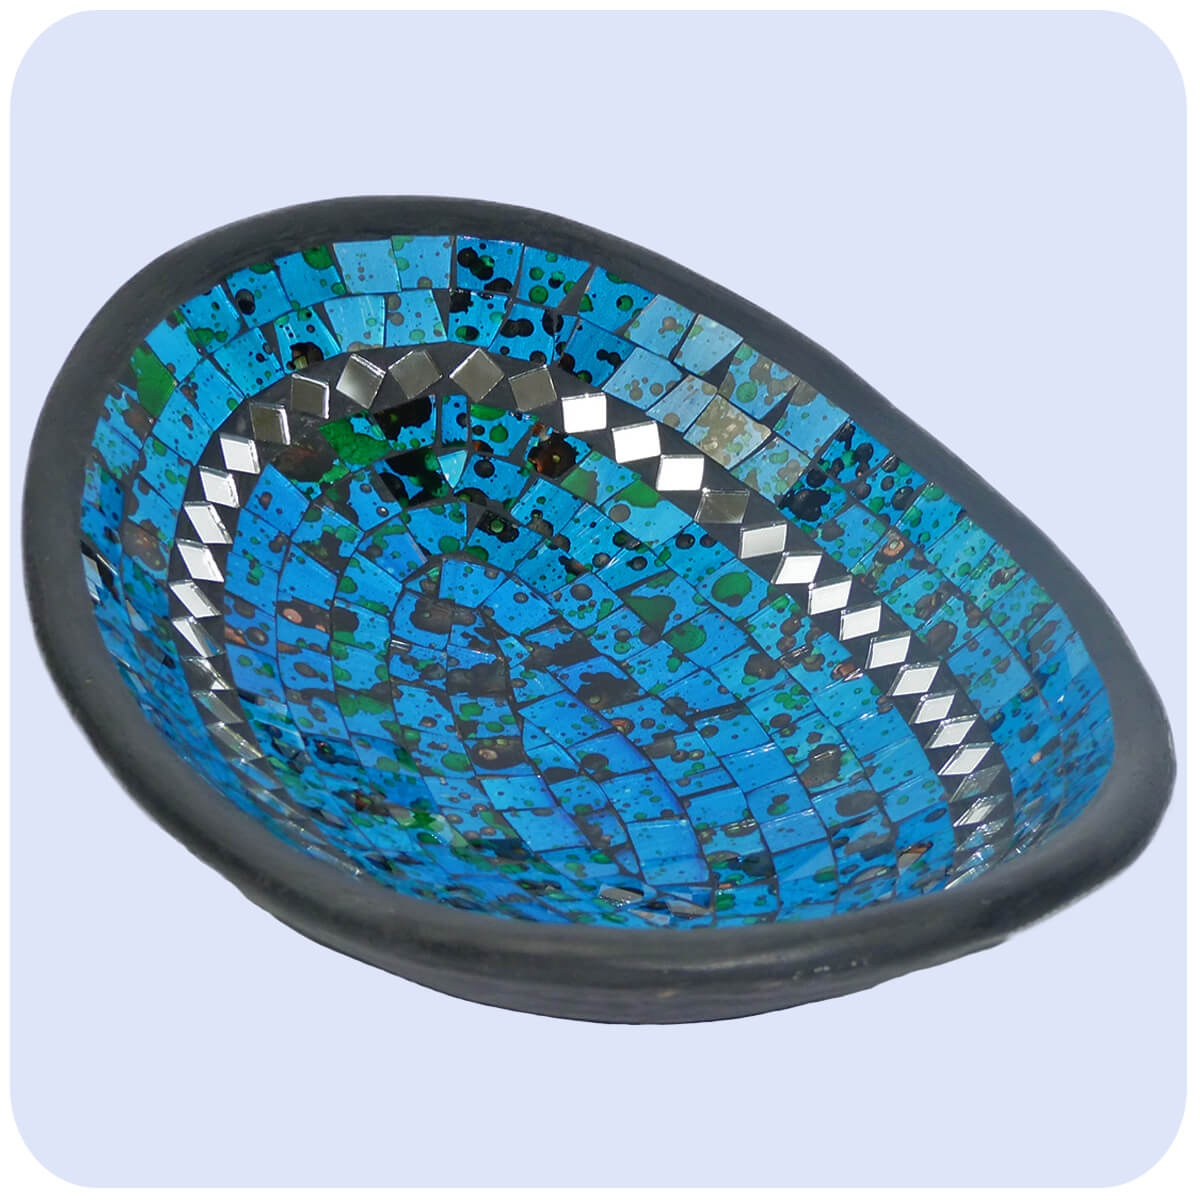 mosaikschale tonschale glasschale dekoschale mosaik kunst deko oval spiegel gro ebay. Black Bedroom Furniture Sets. Home Design Ideas